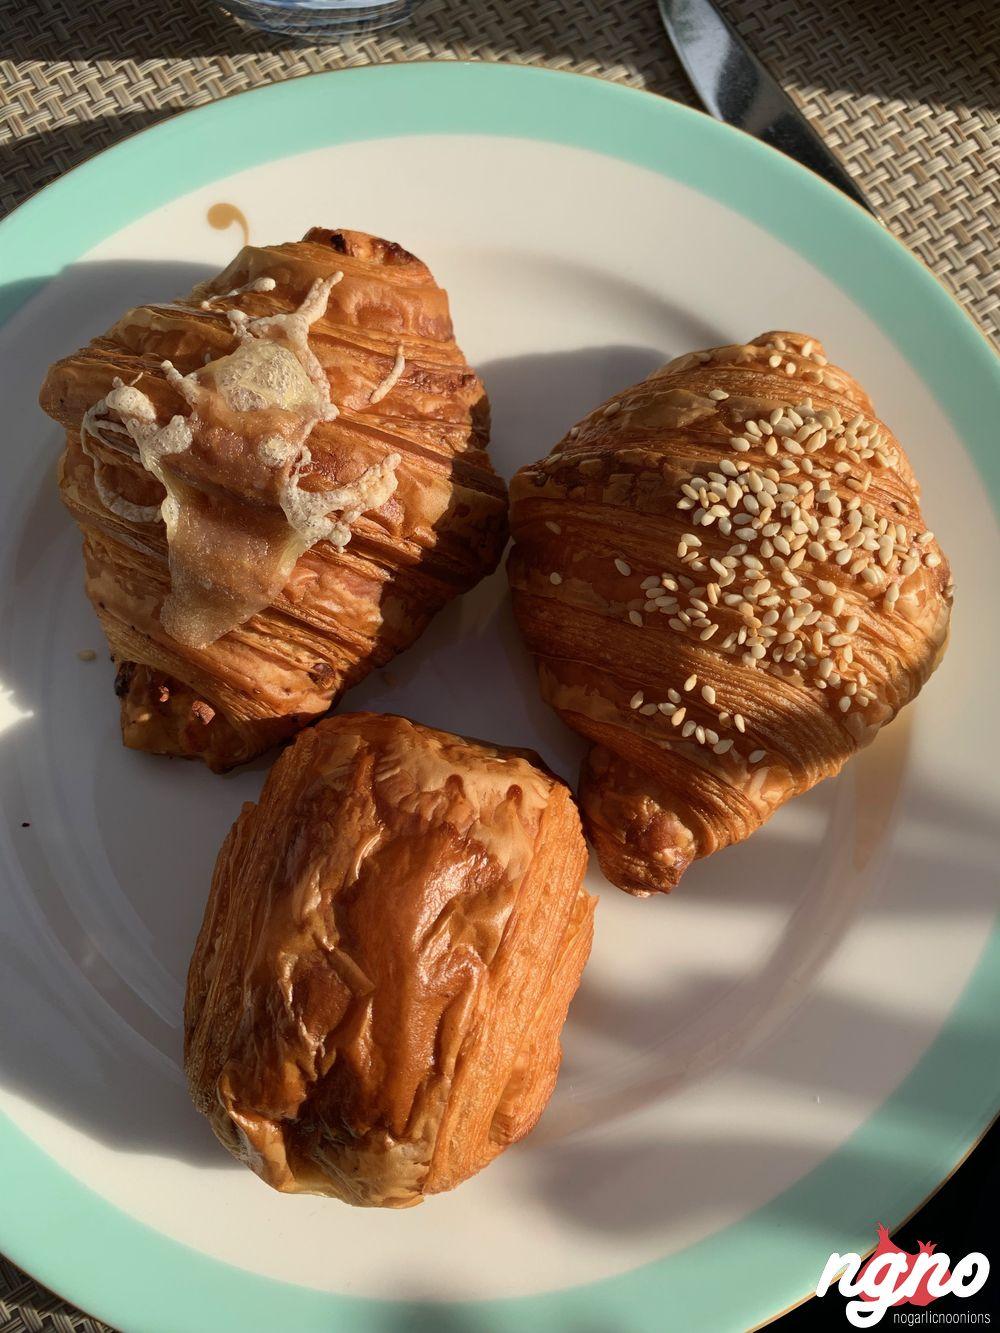 lily-s-breakfast-restaurant-beirut-nogarlicnoonions-452018-11-25-05-38-06